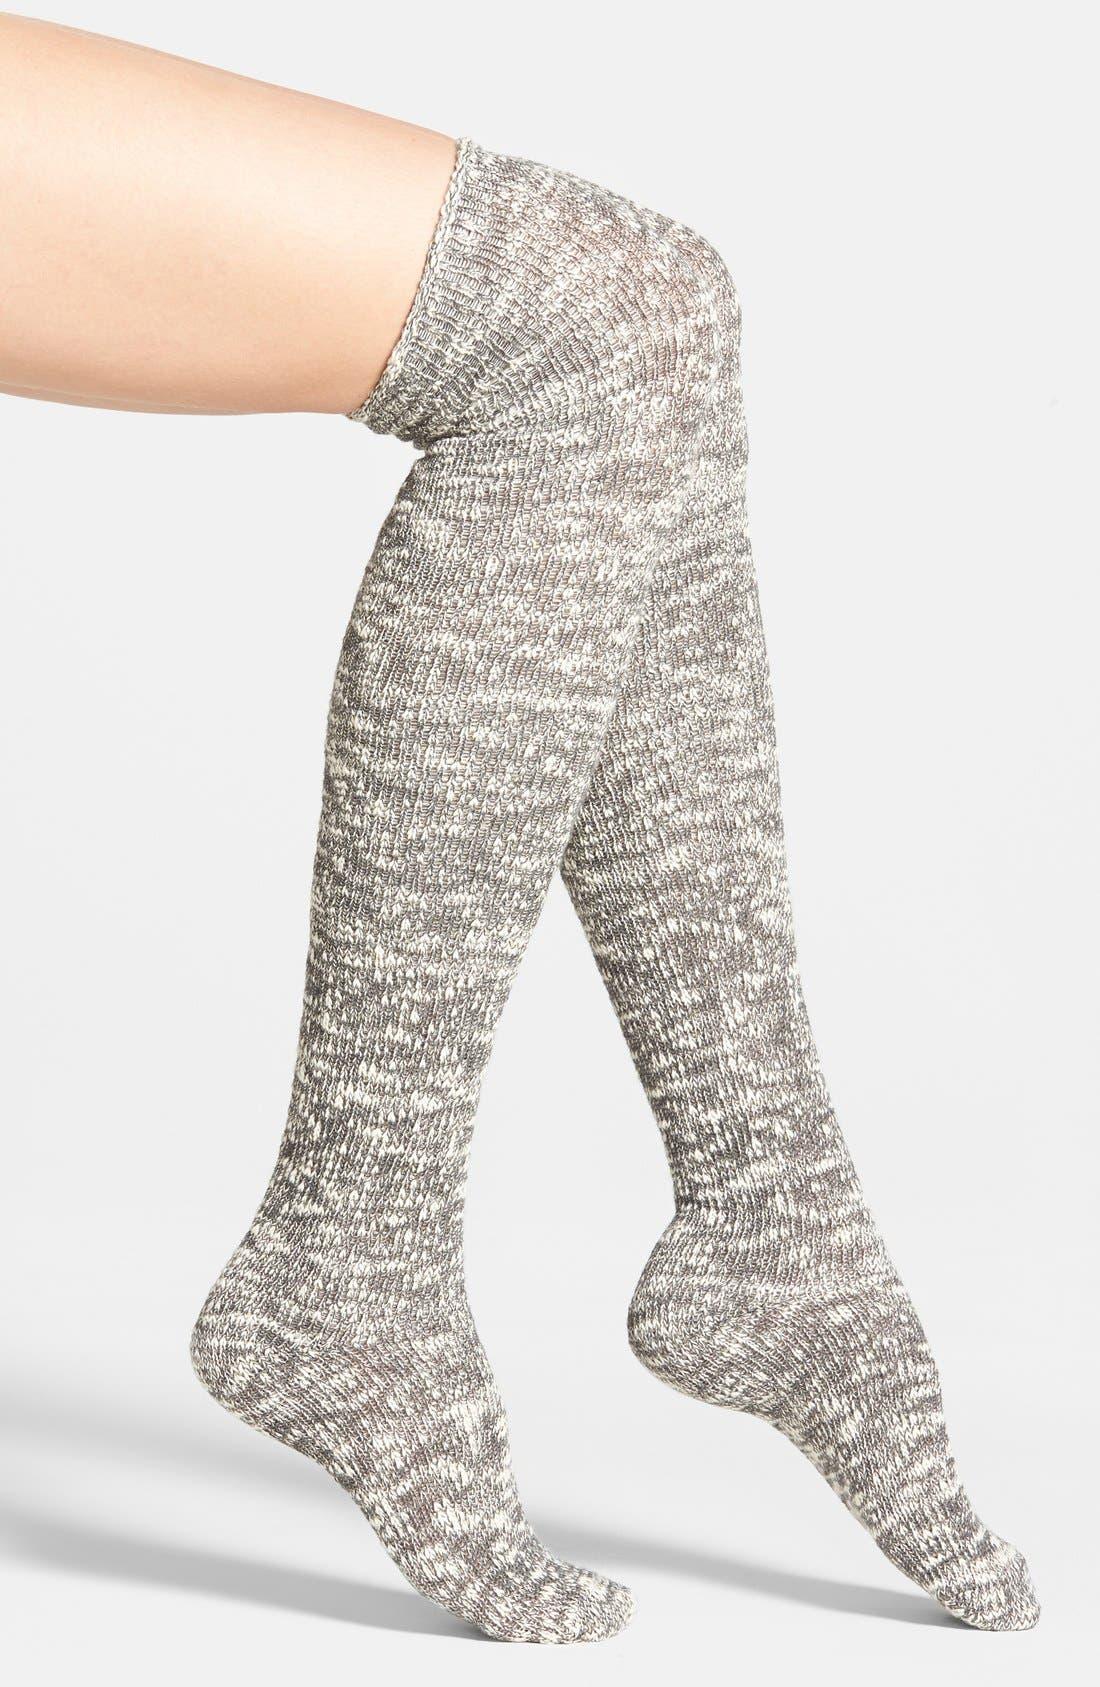 Main Image - Nordstrom Slub Knit Over the Knee Socks